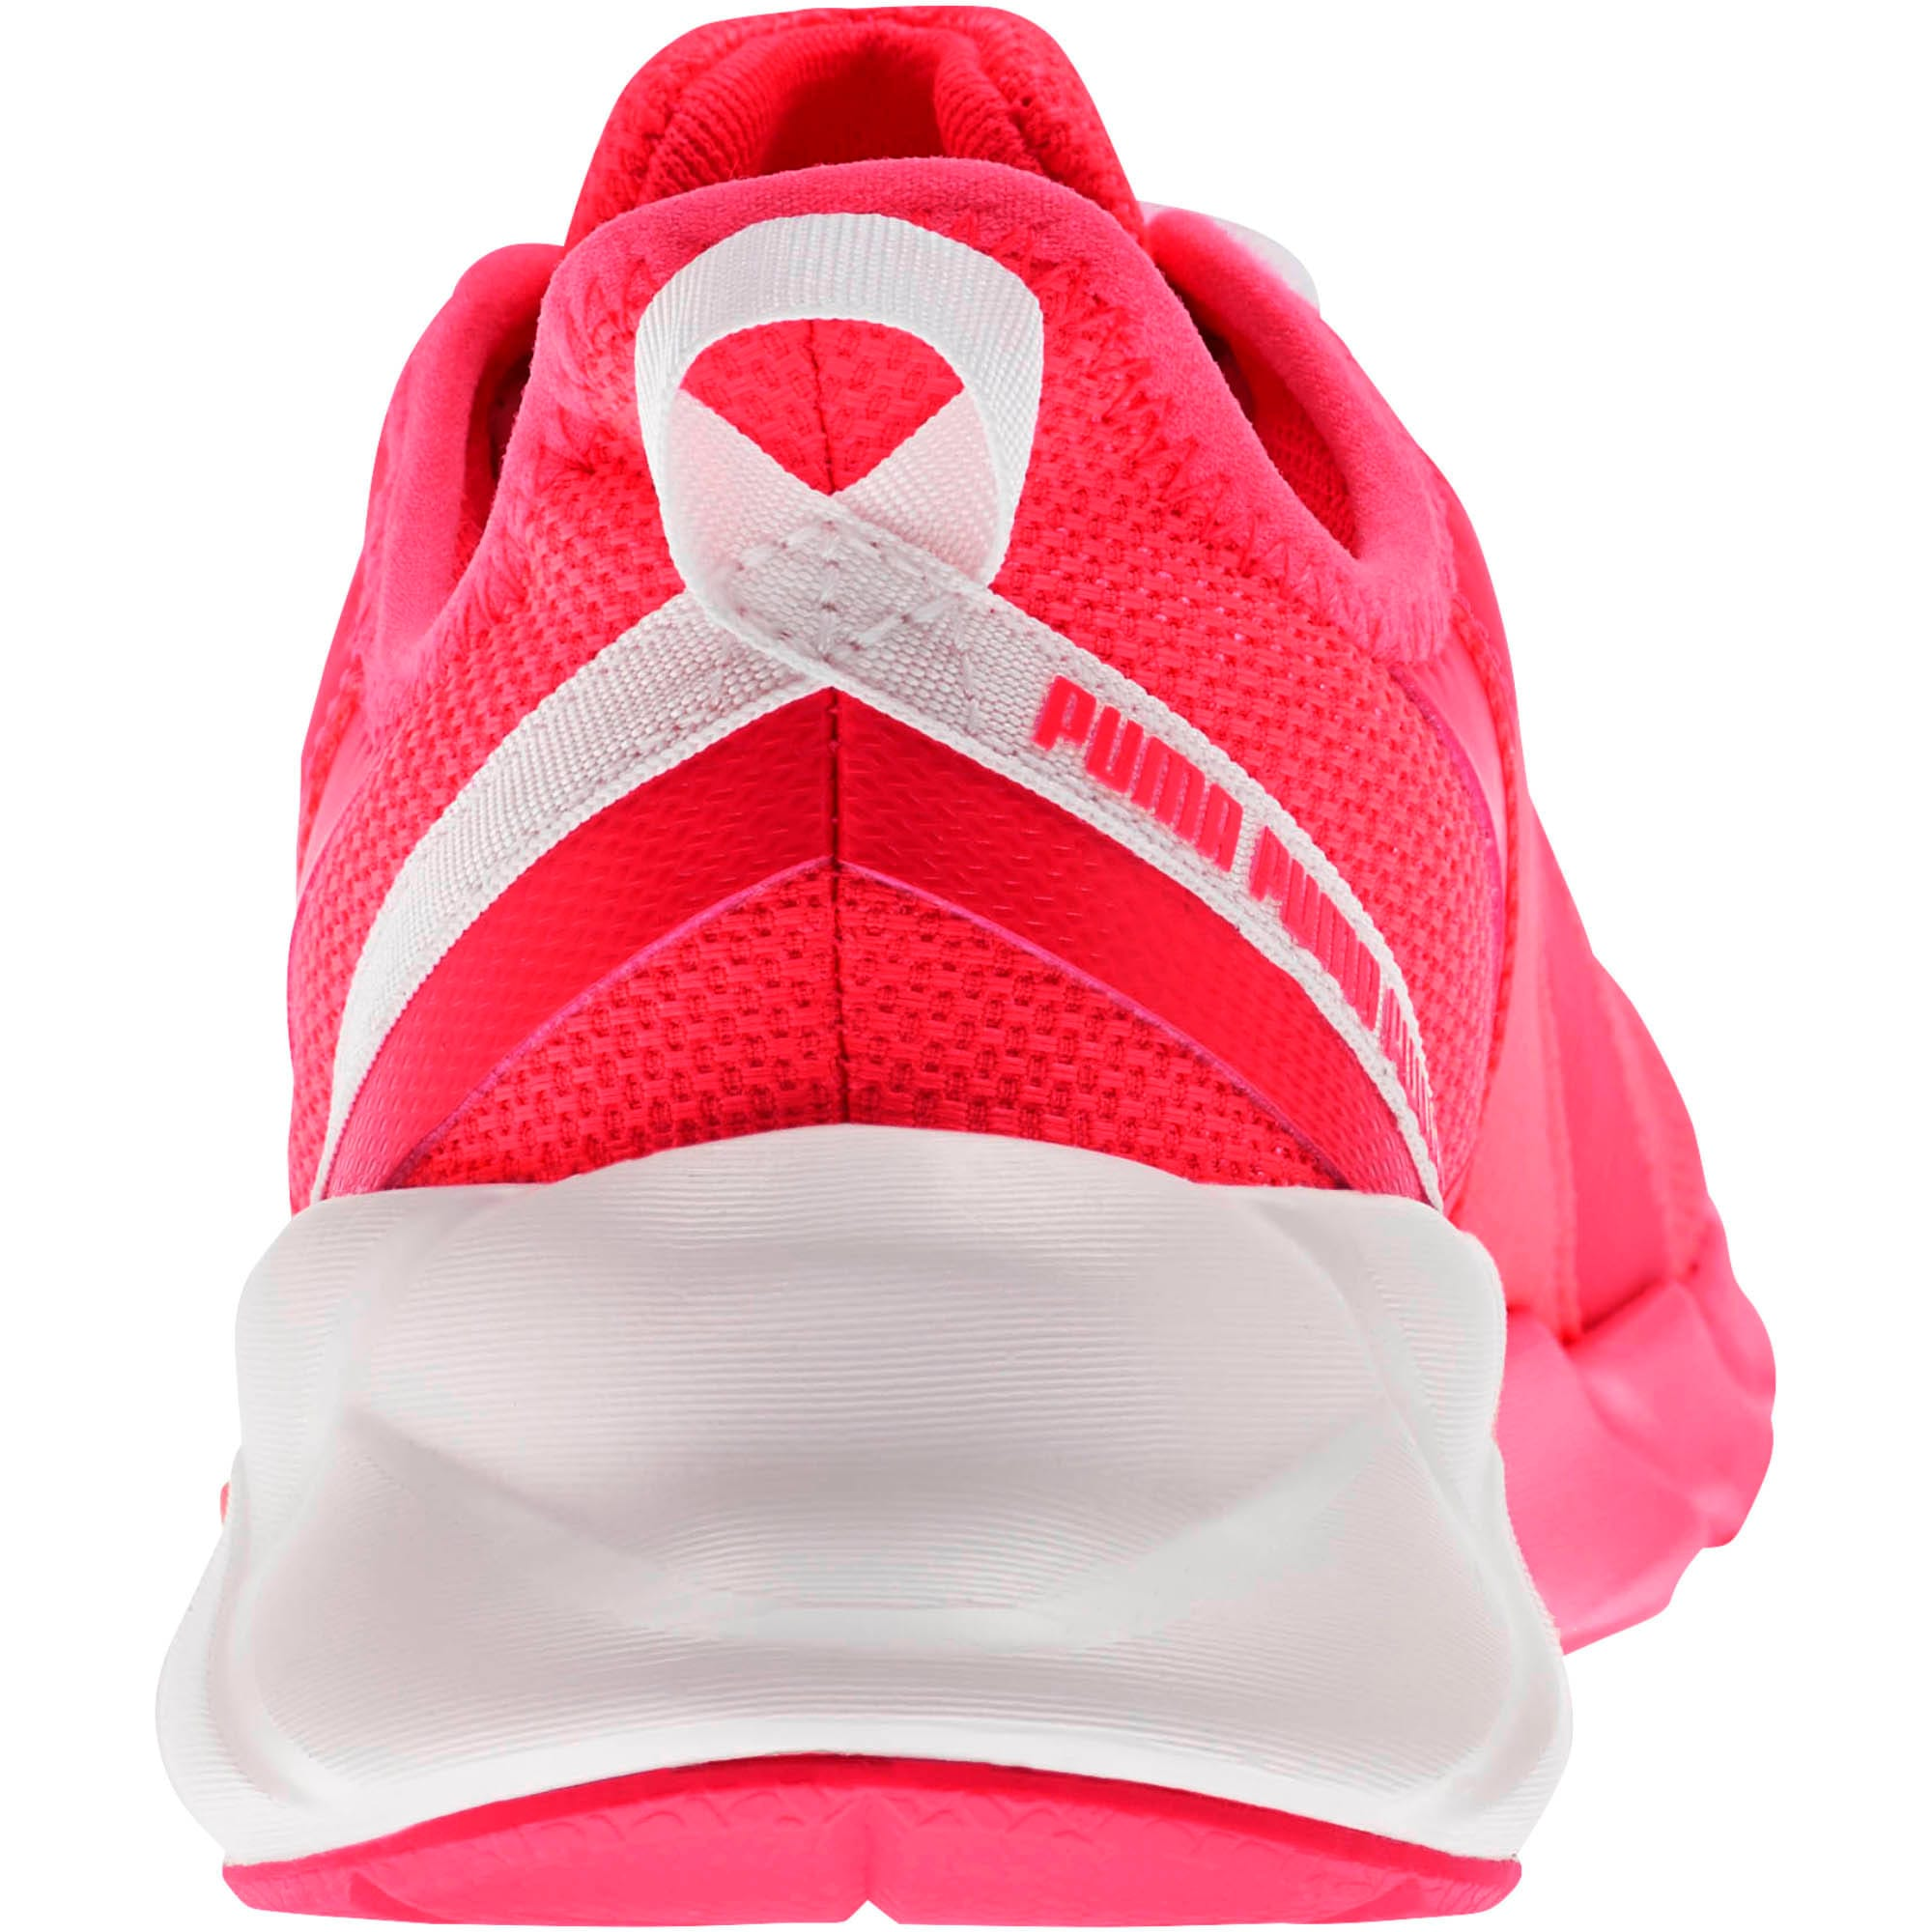 Thumbnail 3 of Weave XT Fade Women's Training Shoes, Pink Alert-Puma White, medium